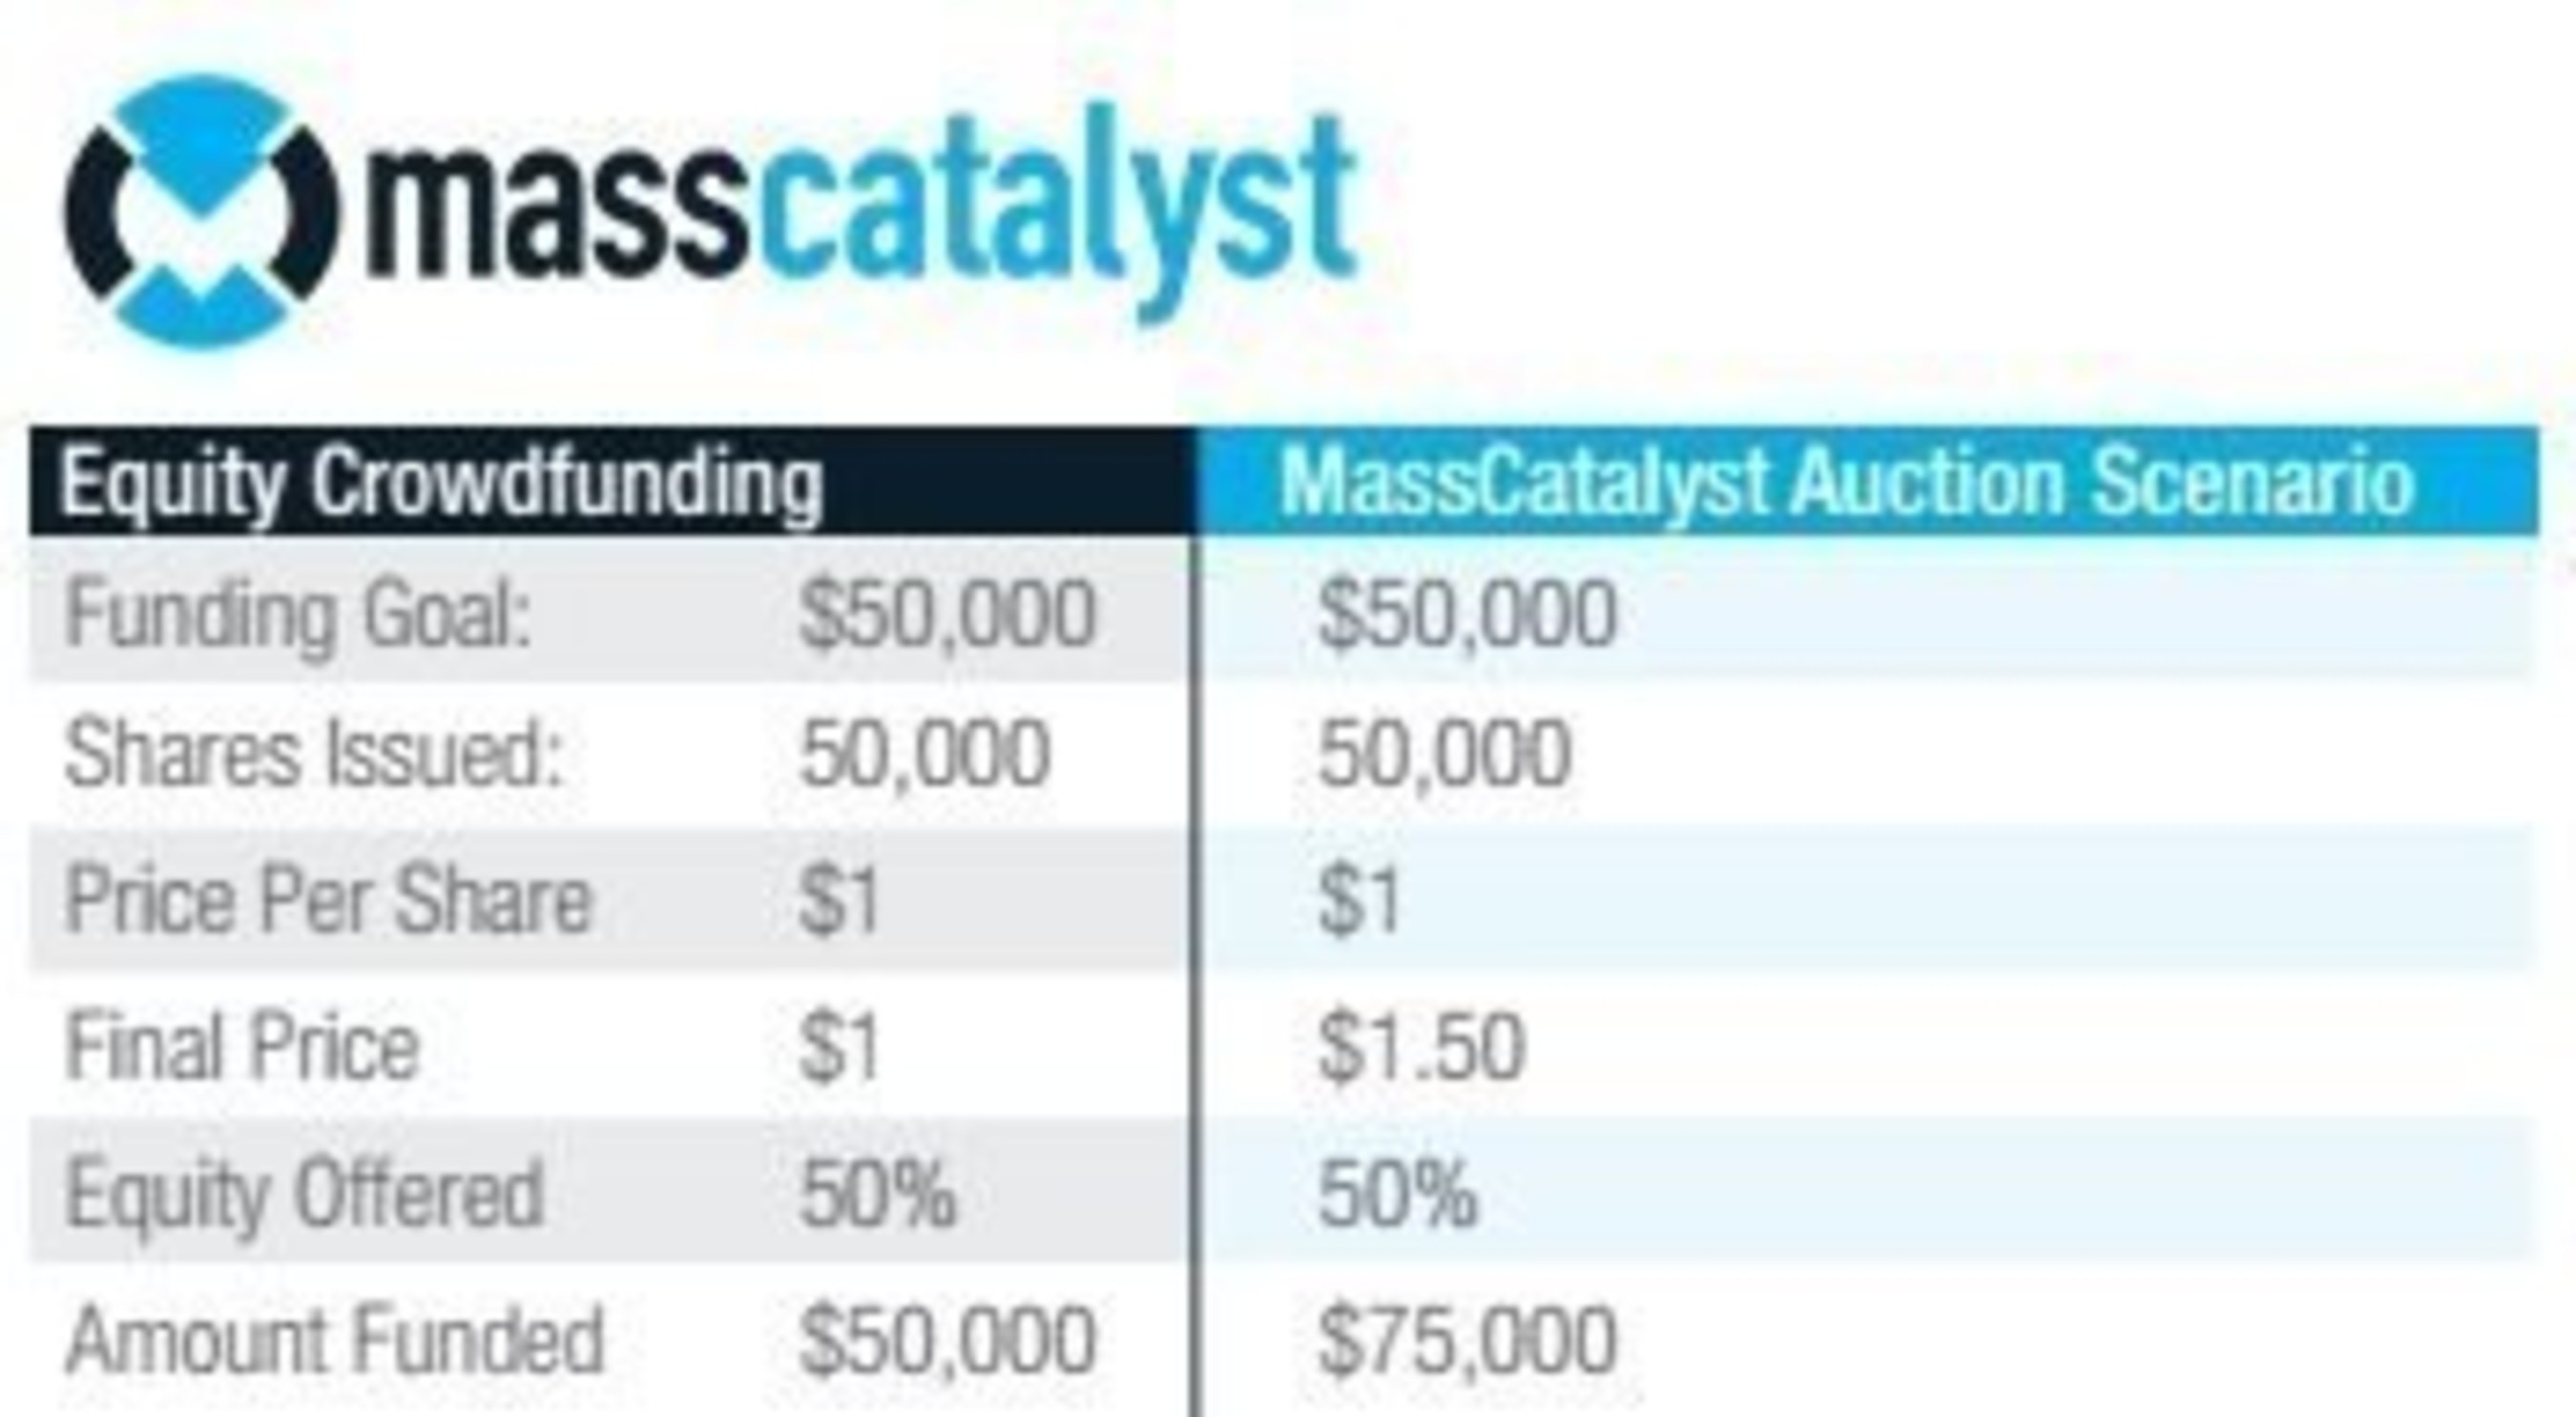 Auction-Based Crowdfunding Platform to Revolutionize Investing